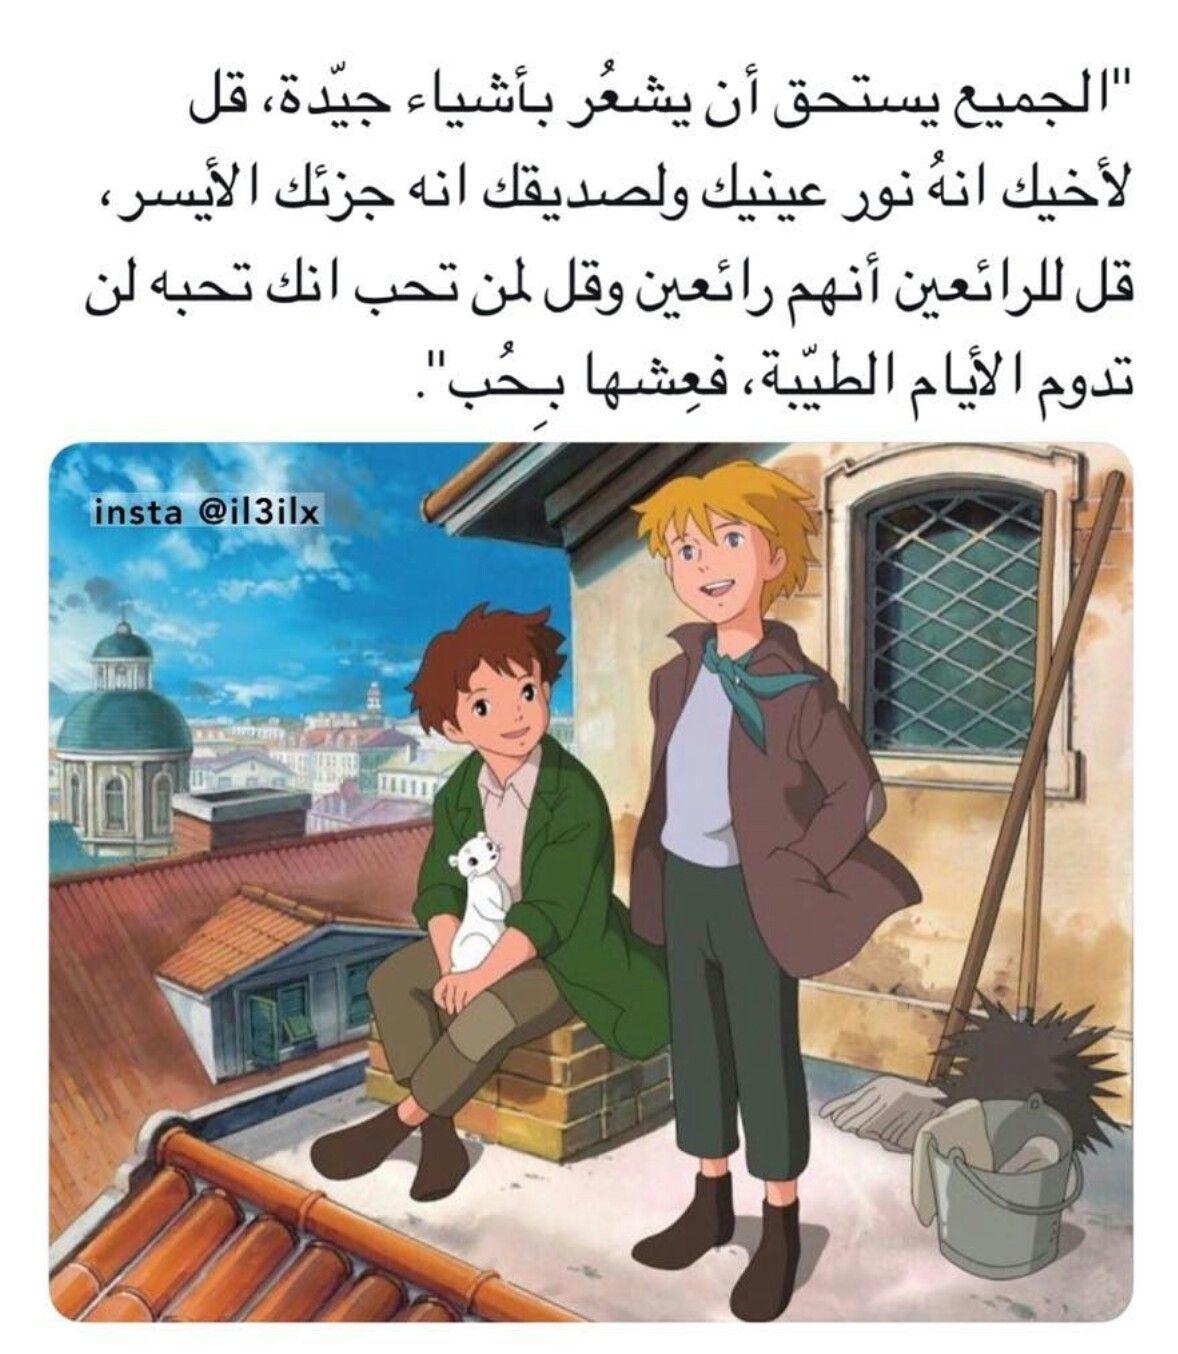 عاش و هو محب و مات من كرههم الفريدو Cartoon Quotes Social Quotes Beautiful Arabic Words